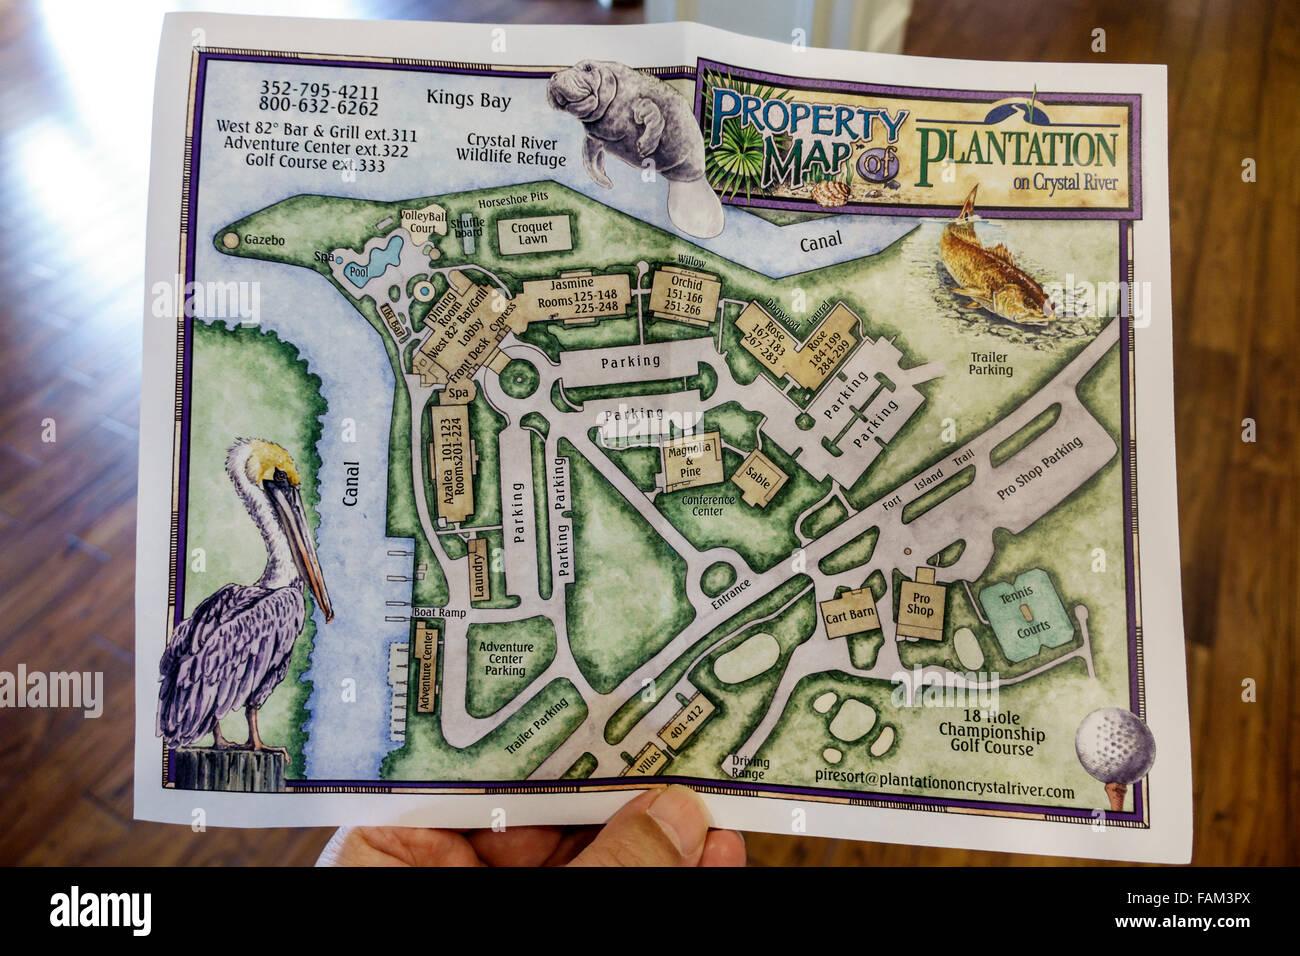 Florida Crystal River Plantation On Crystal River Resort Hotel - Florida map crystal river